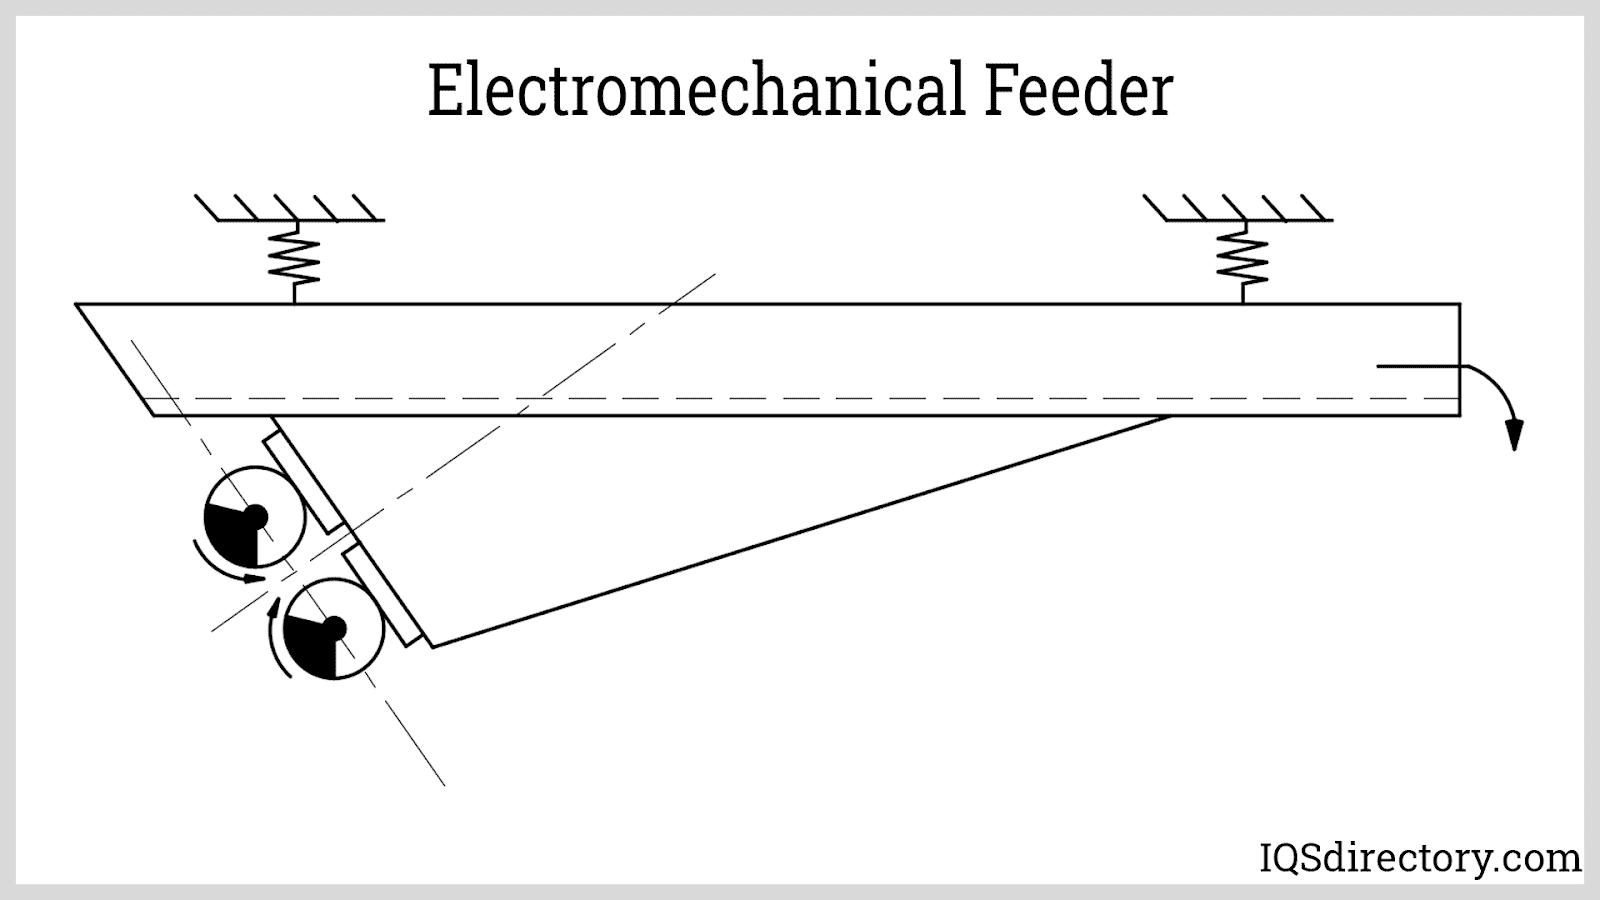 Electromechanical Feeder